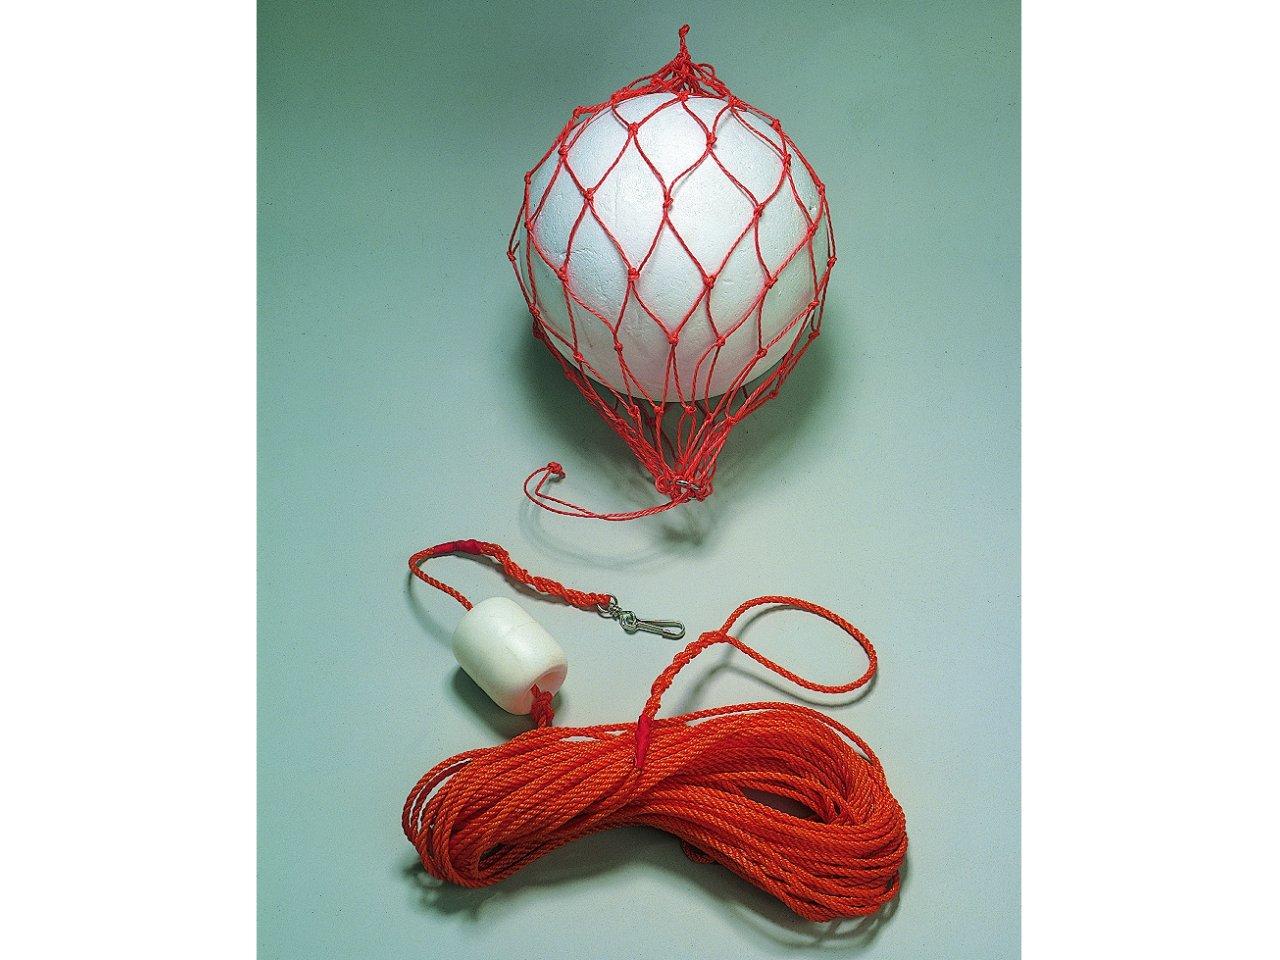 R771017 Rettungswurfball mitLeine I